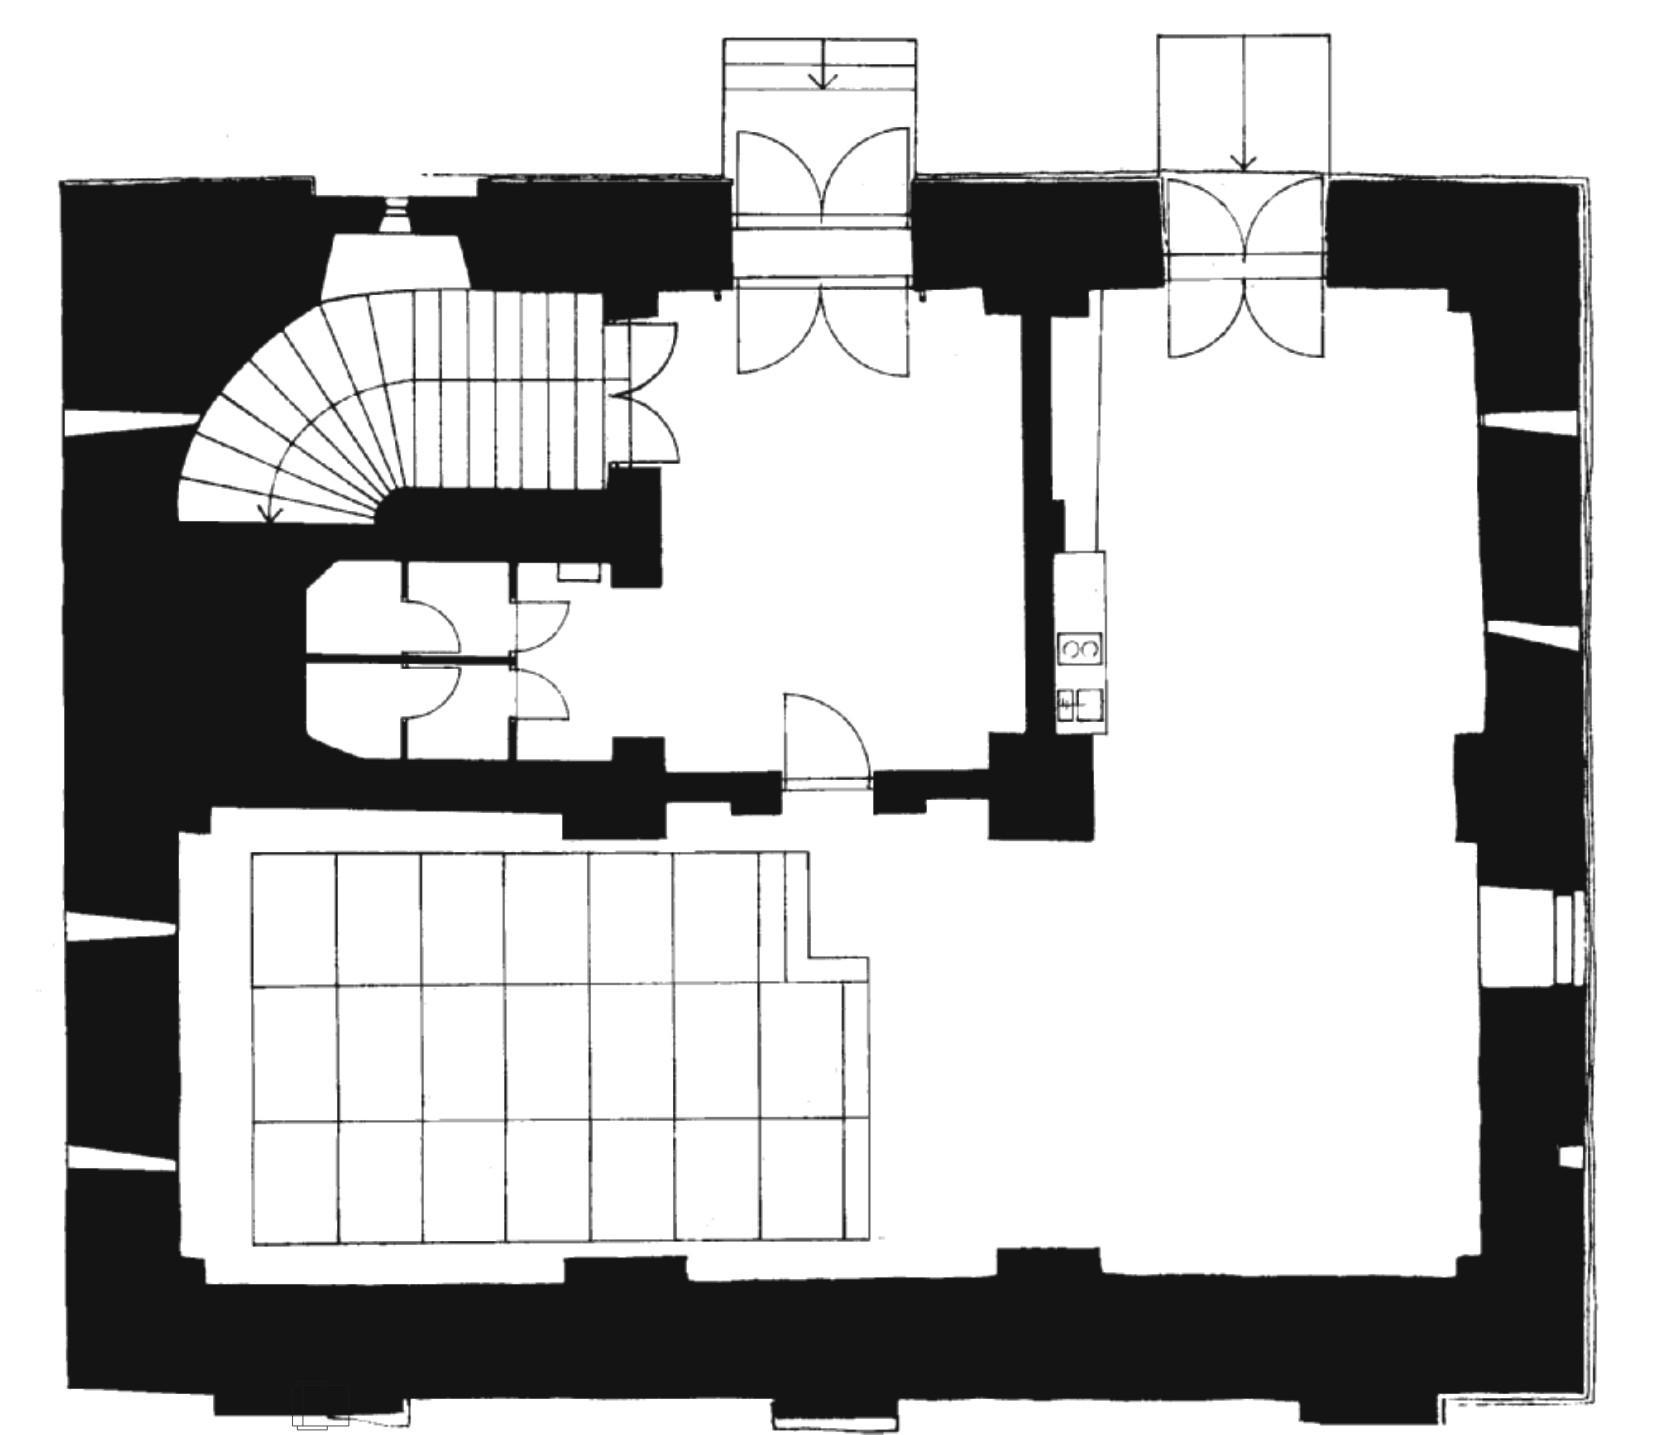 Ballast Room Max 54